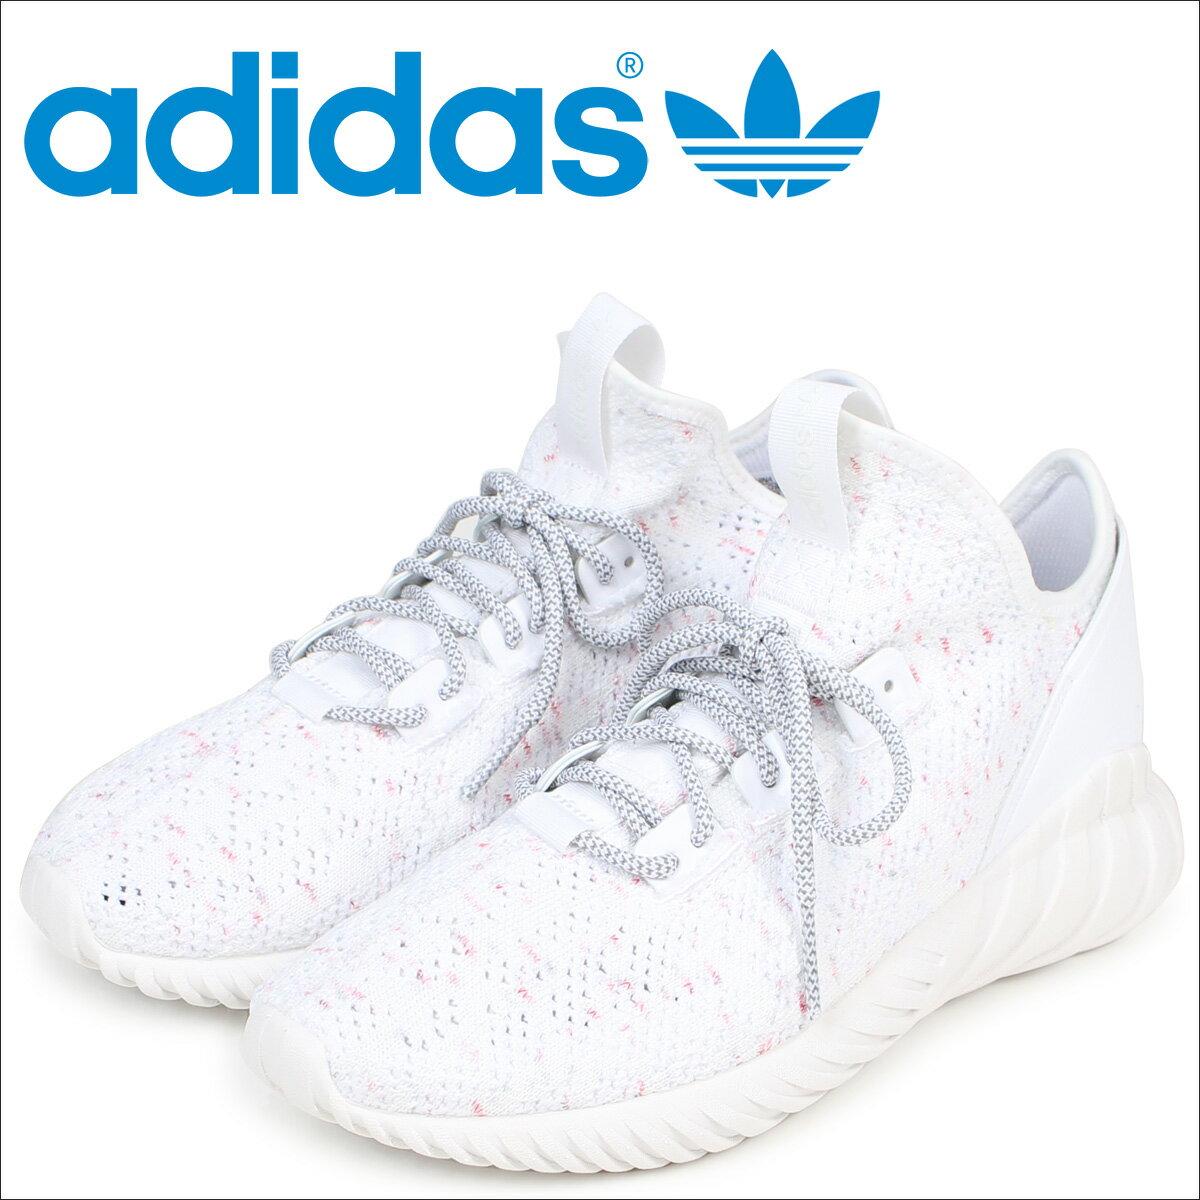 adidas originals チューブラー アディダス スニーカー TUBULAR DOOM SOCK PK メンズ CQ0941 靴 ホワイト [12/15 新入荷]